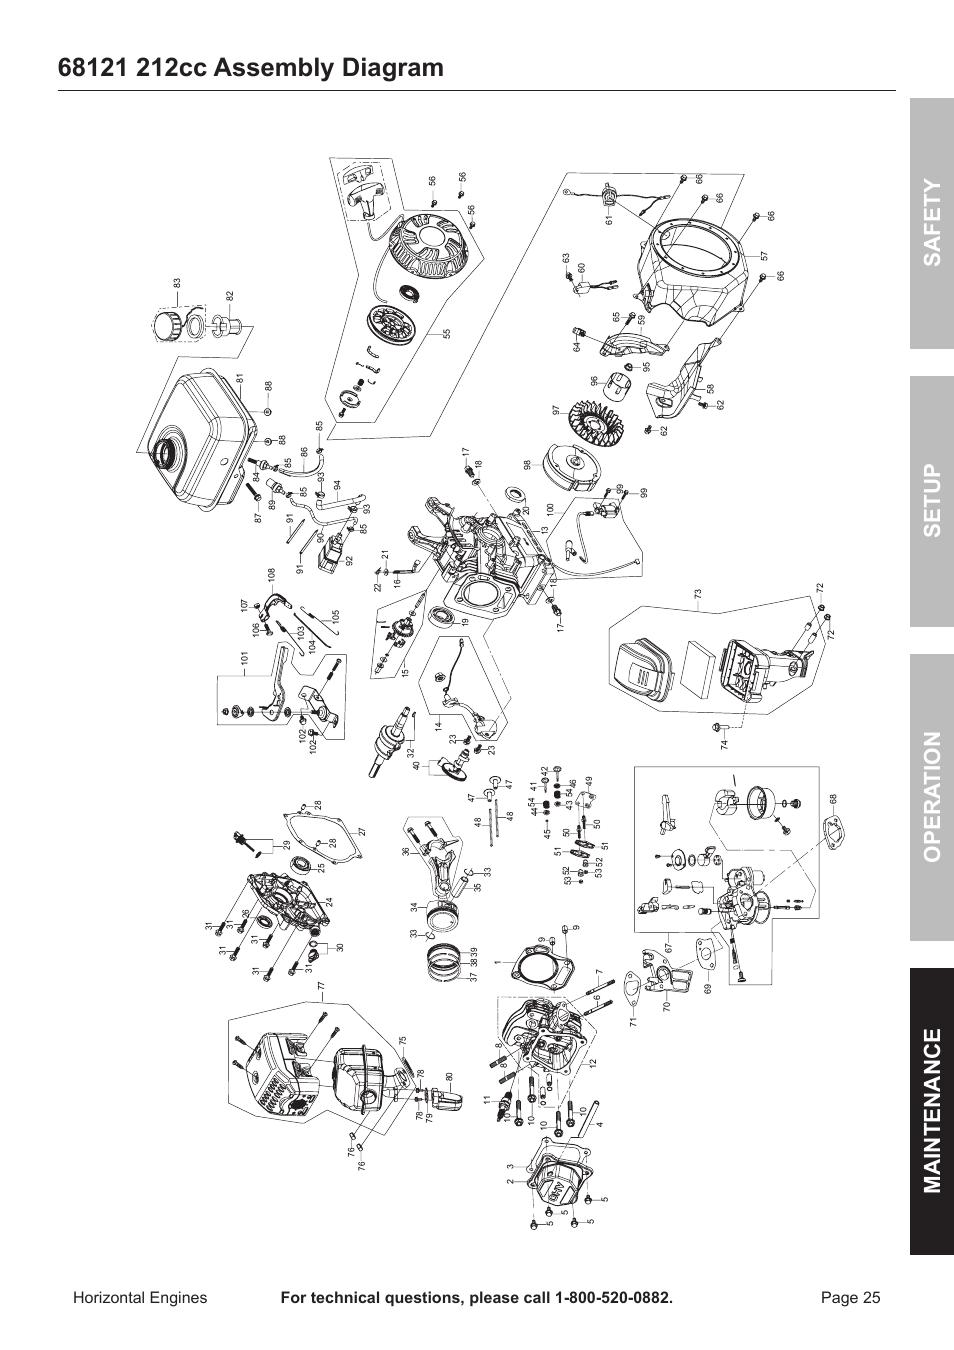 Harbor Freight Predator 420 Engine Wiring Diagram on